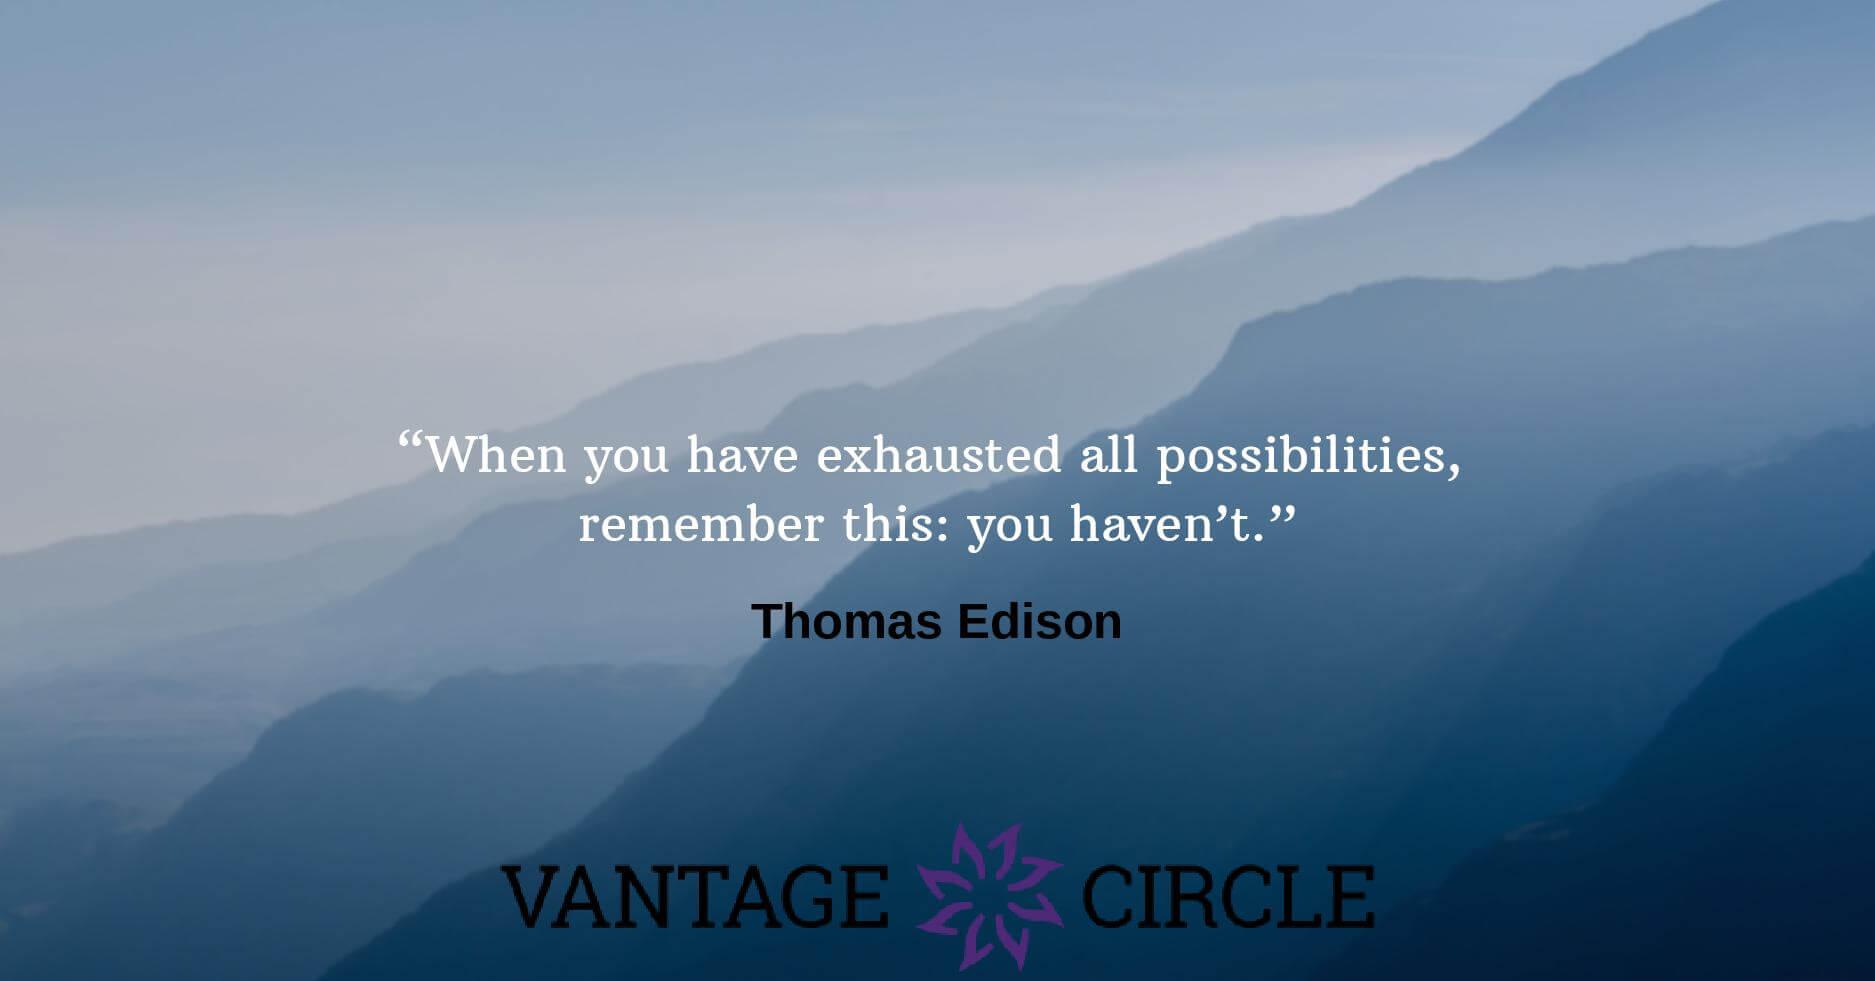 Employee-motivational-quotes-Thomas-Edison